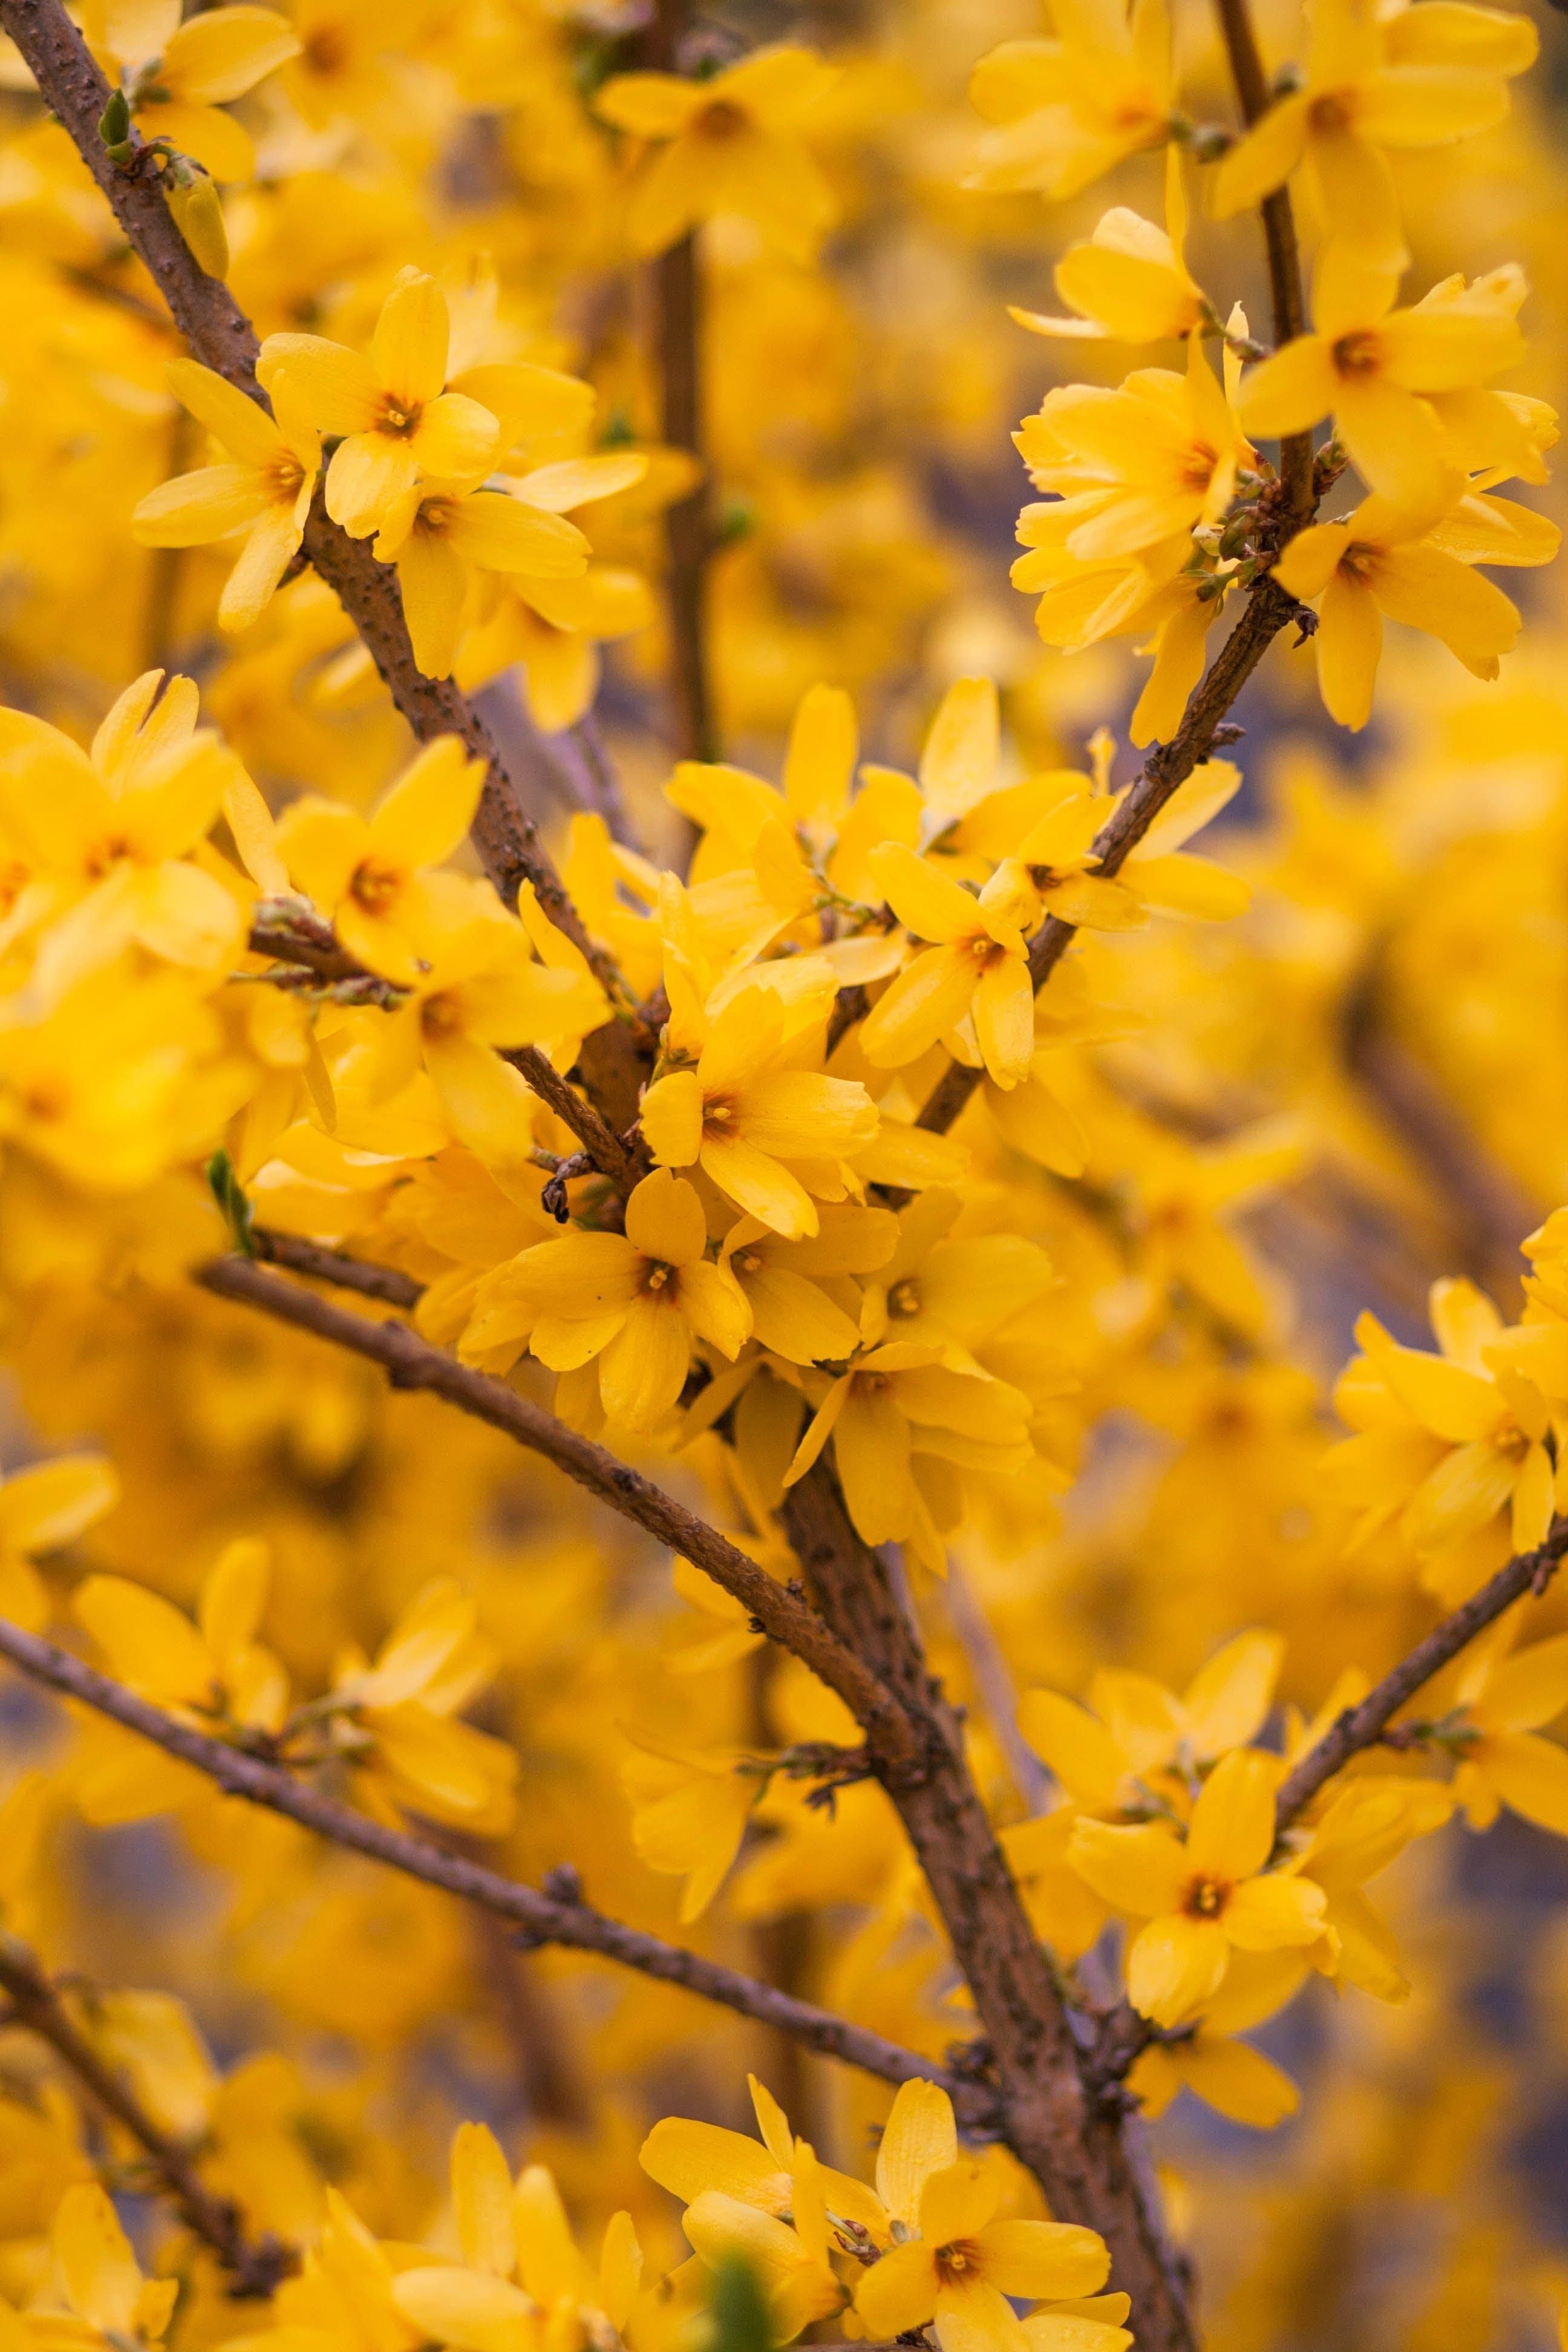 Macro Photography of Yellow Flowering Tree